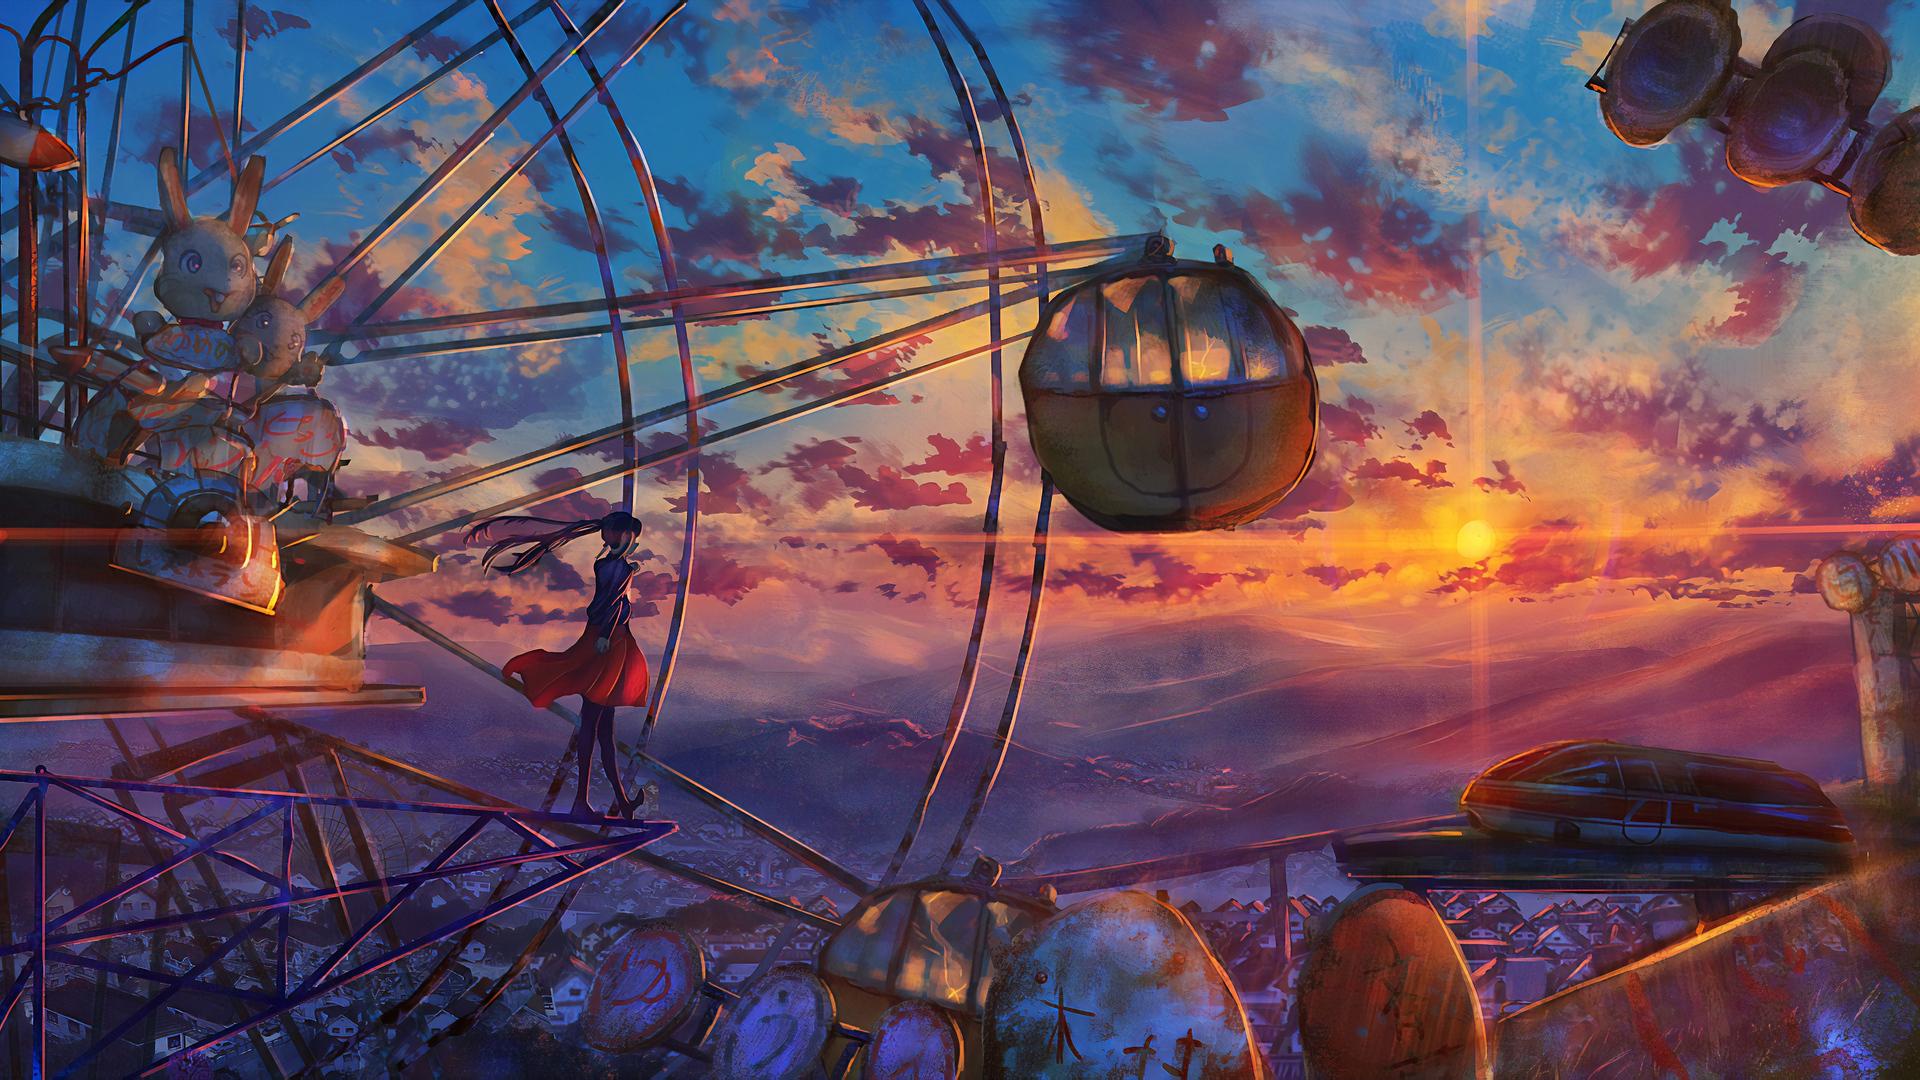 1920x1080 Anime Ferris Wheel Painting Laptop Full HD 1080P ...